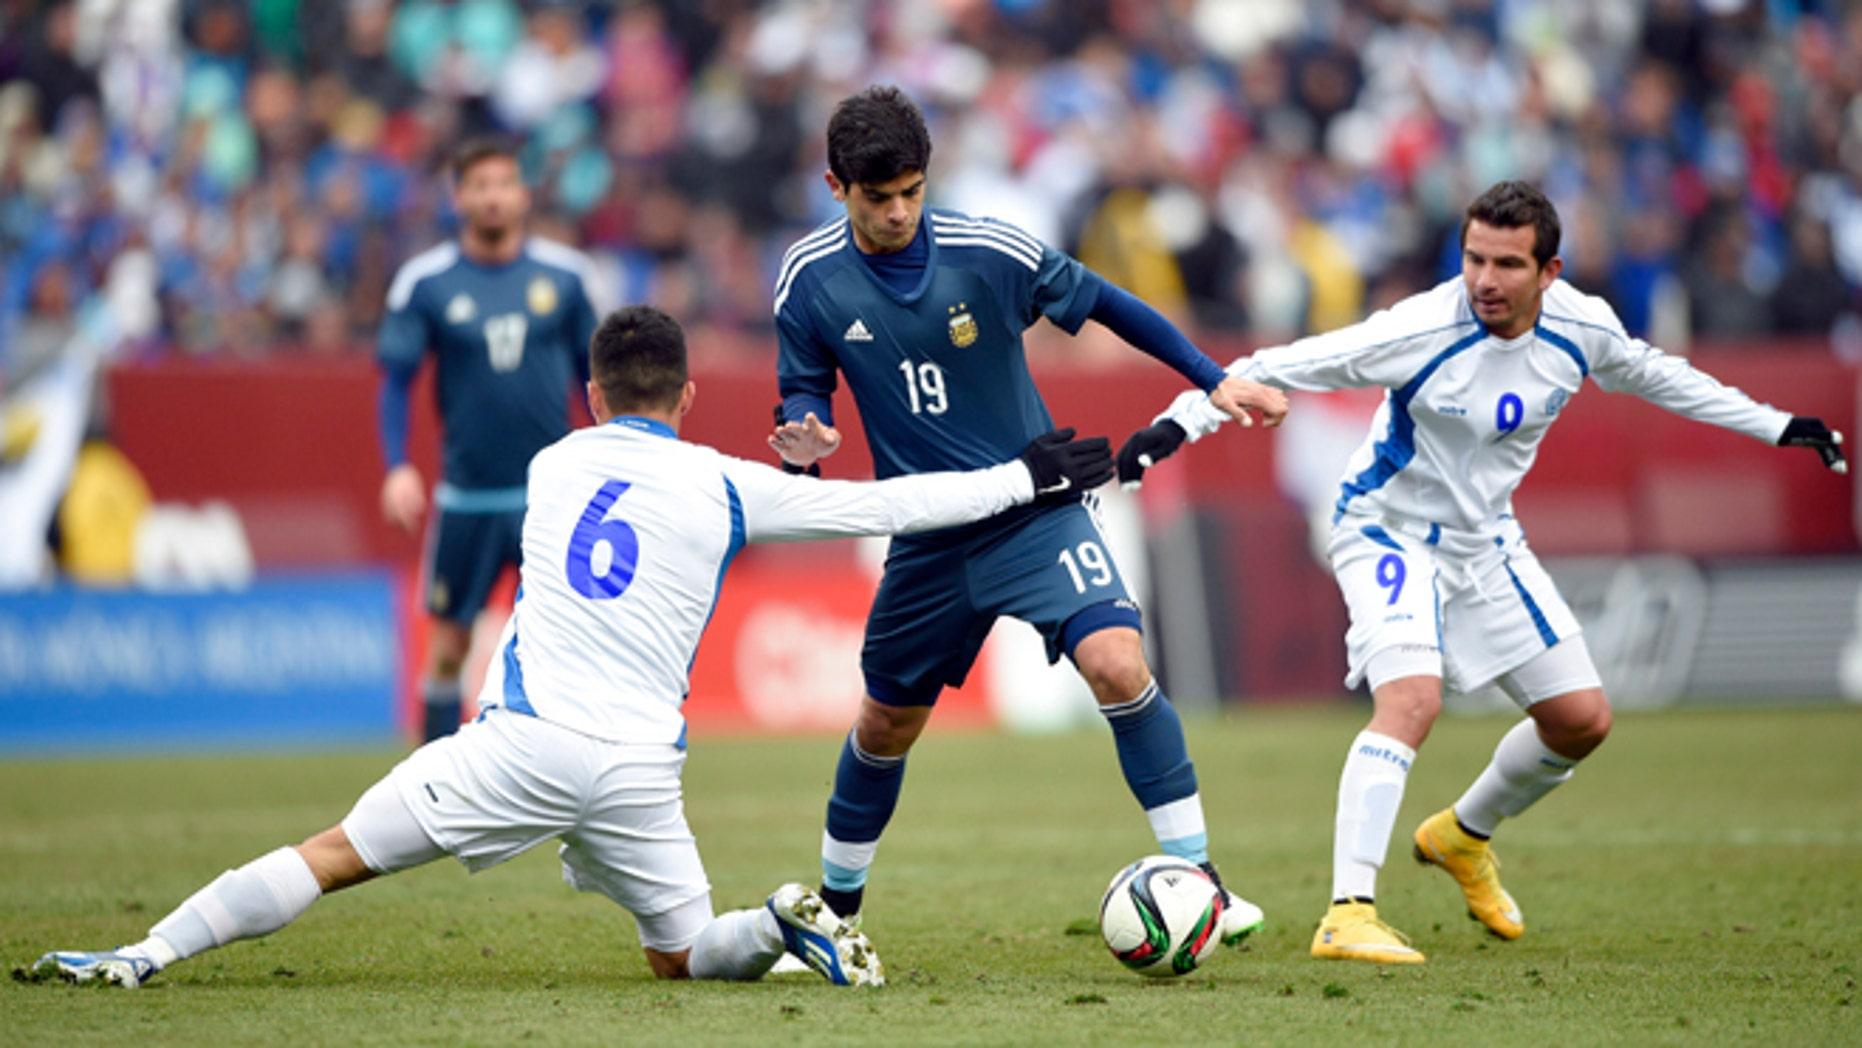 Argentina's Ever Banega battles for the ball against El Salvador's Richard Menjivar and Rafael Burgos, March 28, 2015.